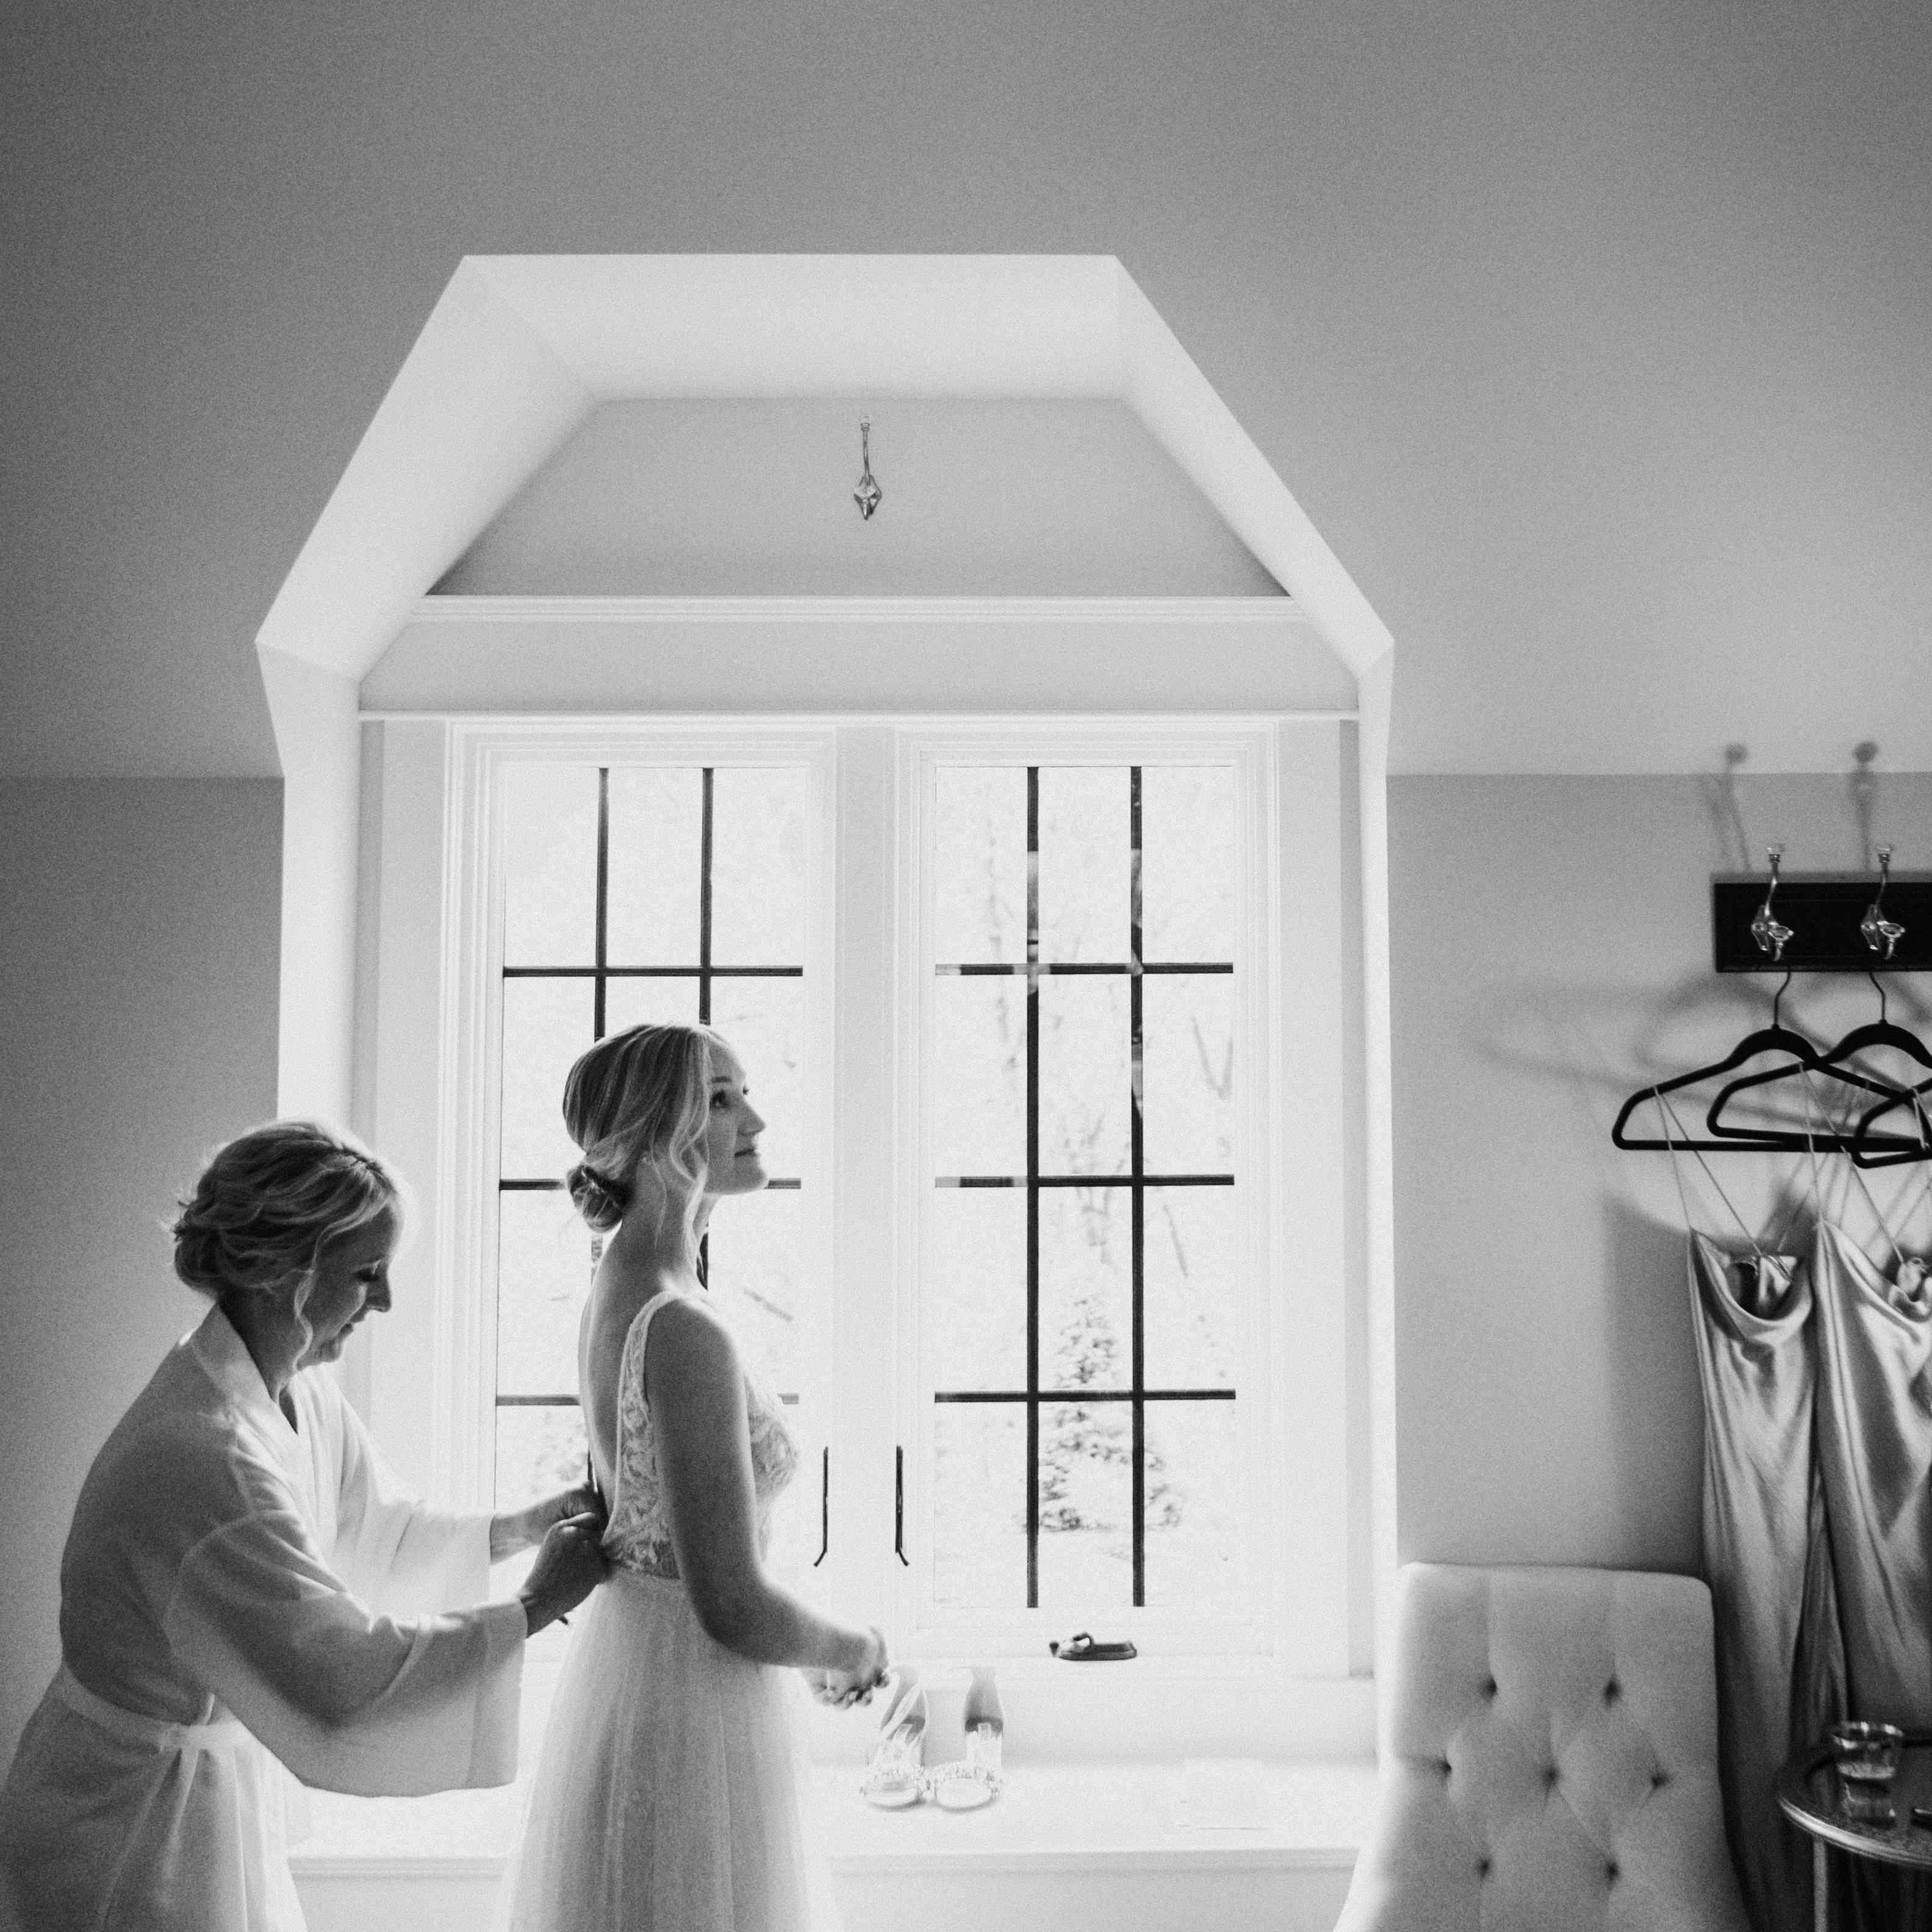 Vintage Wedding Dresses Michigan: Musician Quinn XCII And Macy Uekert's Vintage-Inspired